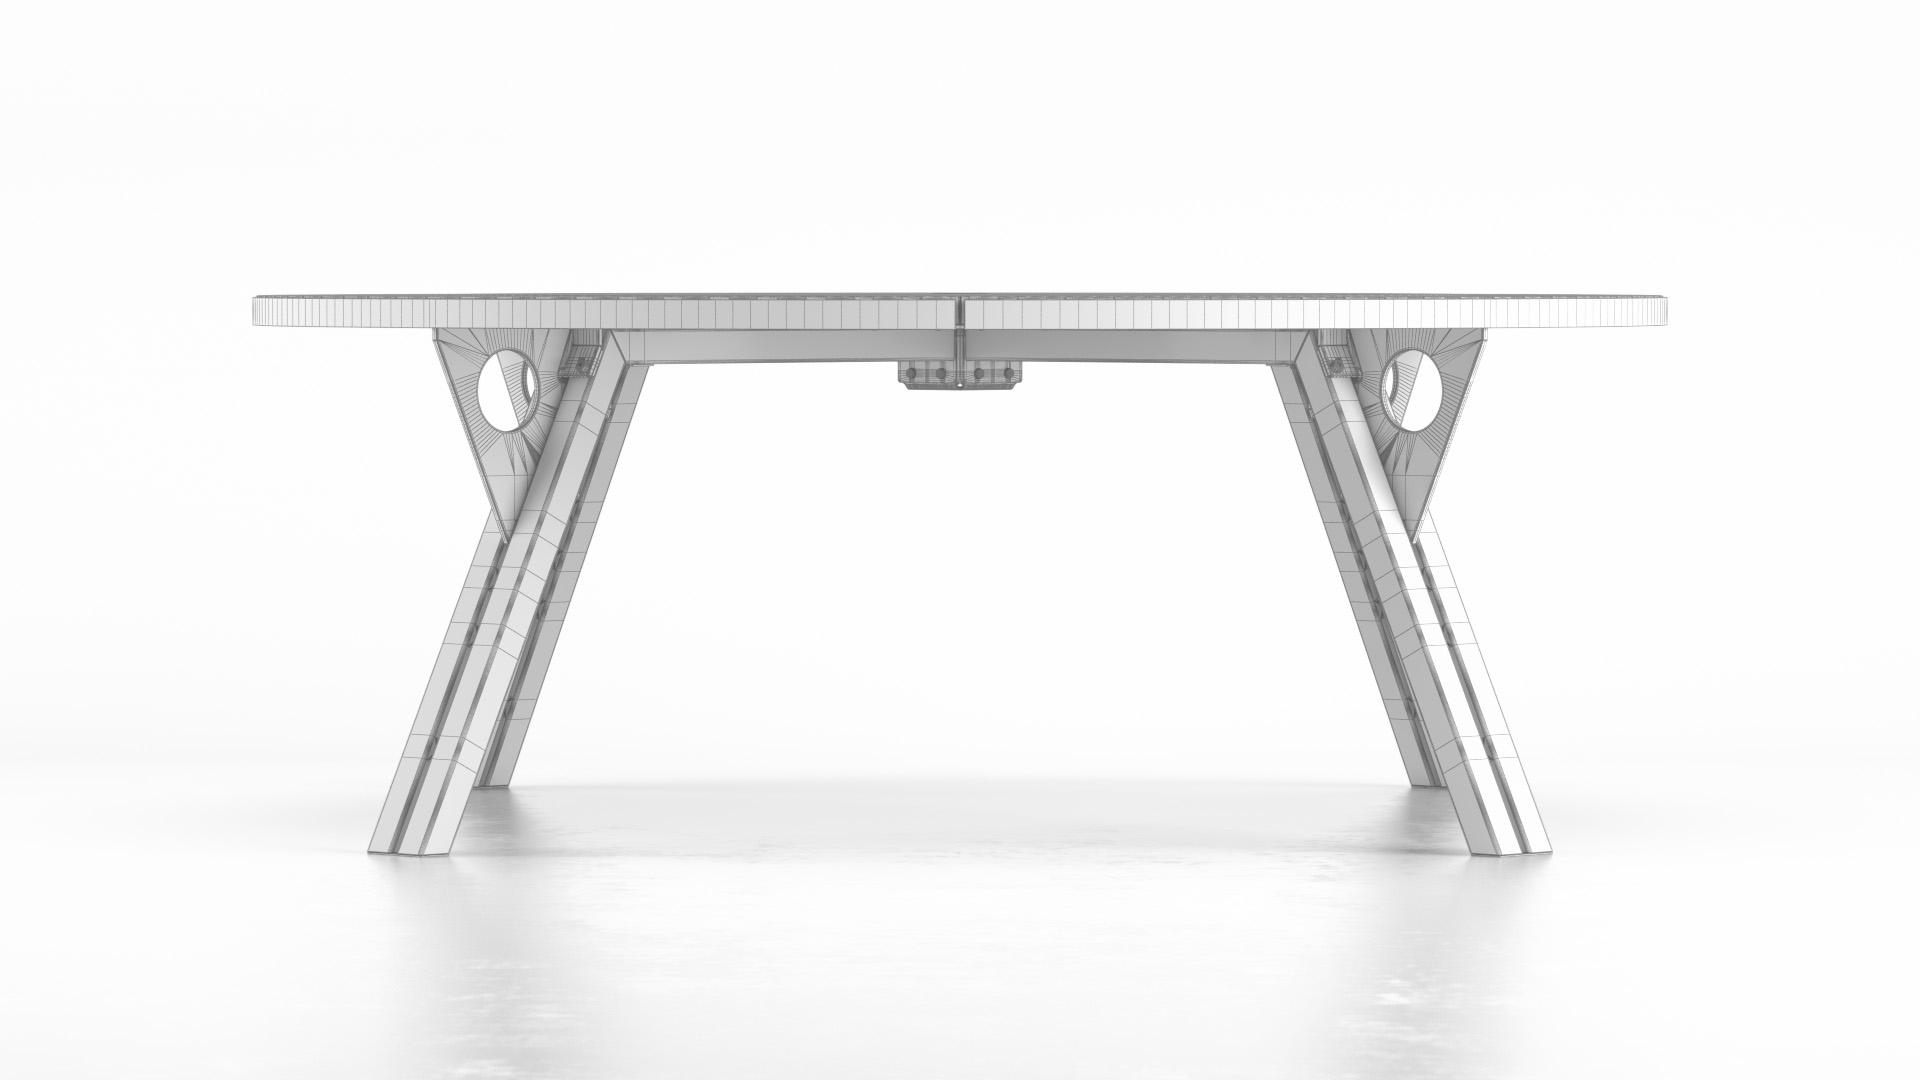 Gargantua_Table_Mode2_WhiteSet_01_wire_0002